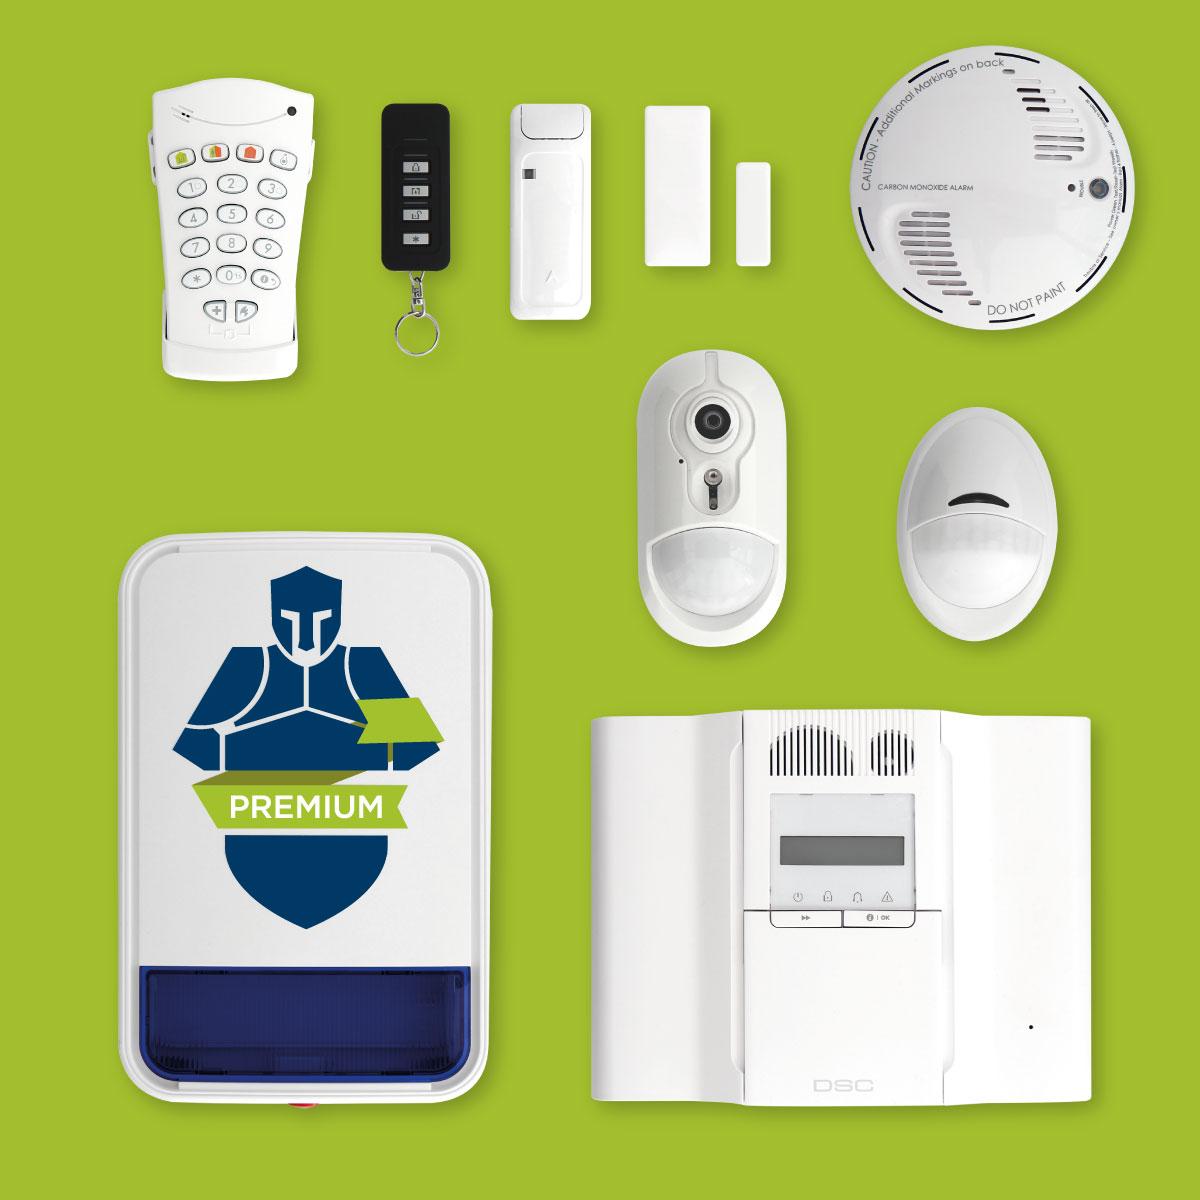 kit allarme italpol premium